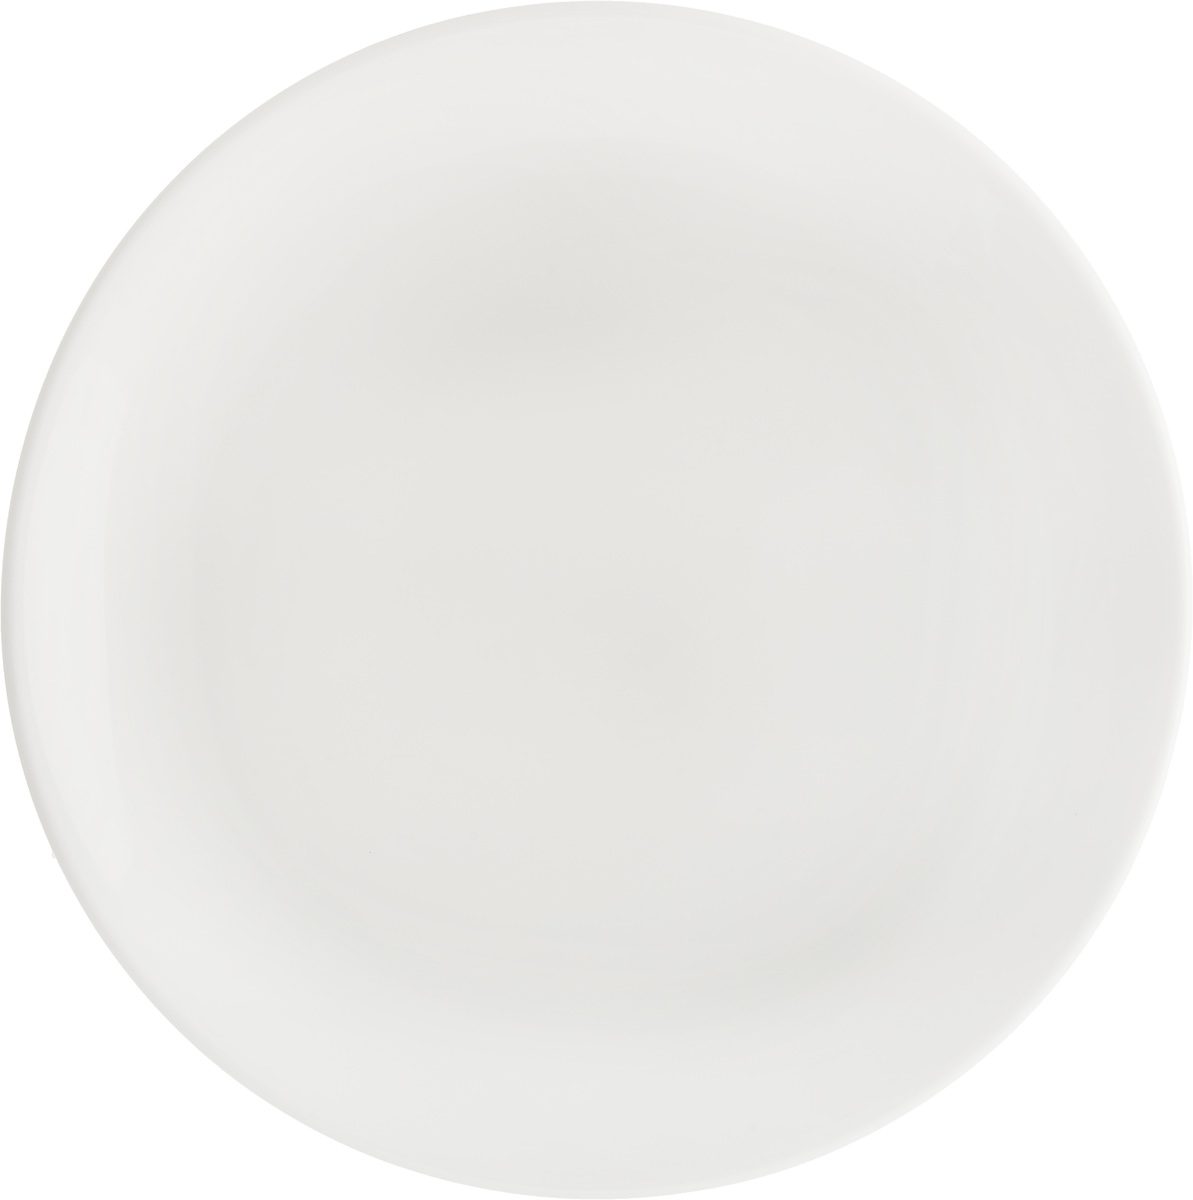 Тарелка Ariane Коуп, диаметр 18 см. AVCARN11018